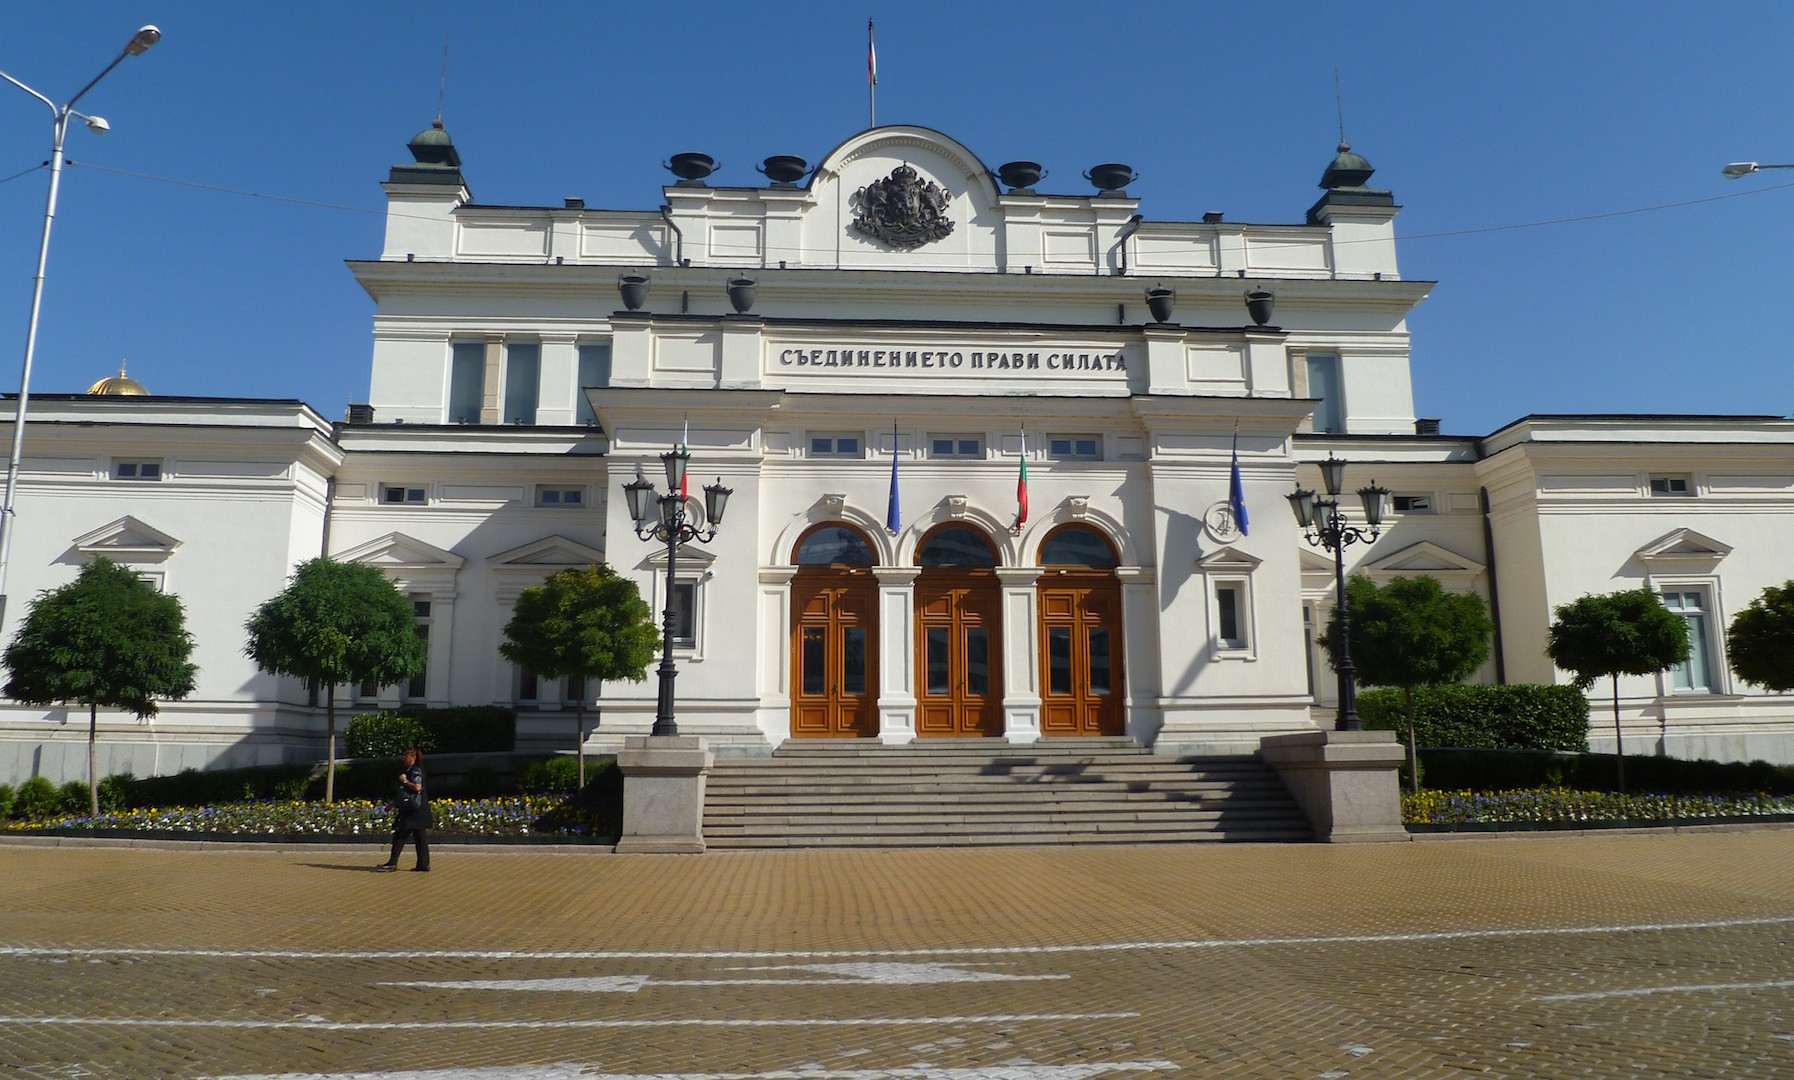 Bulgaria: Gov't publishes budget update